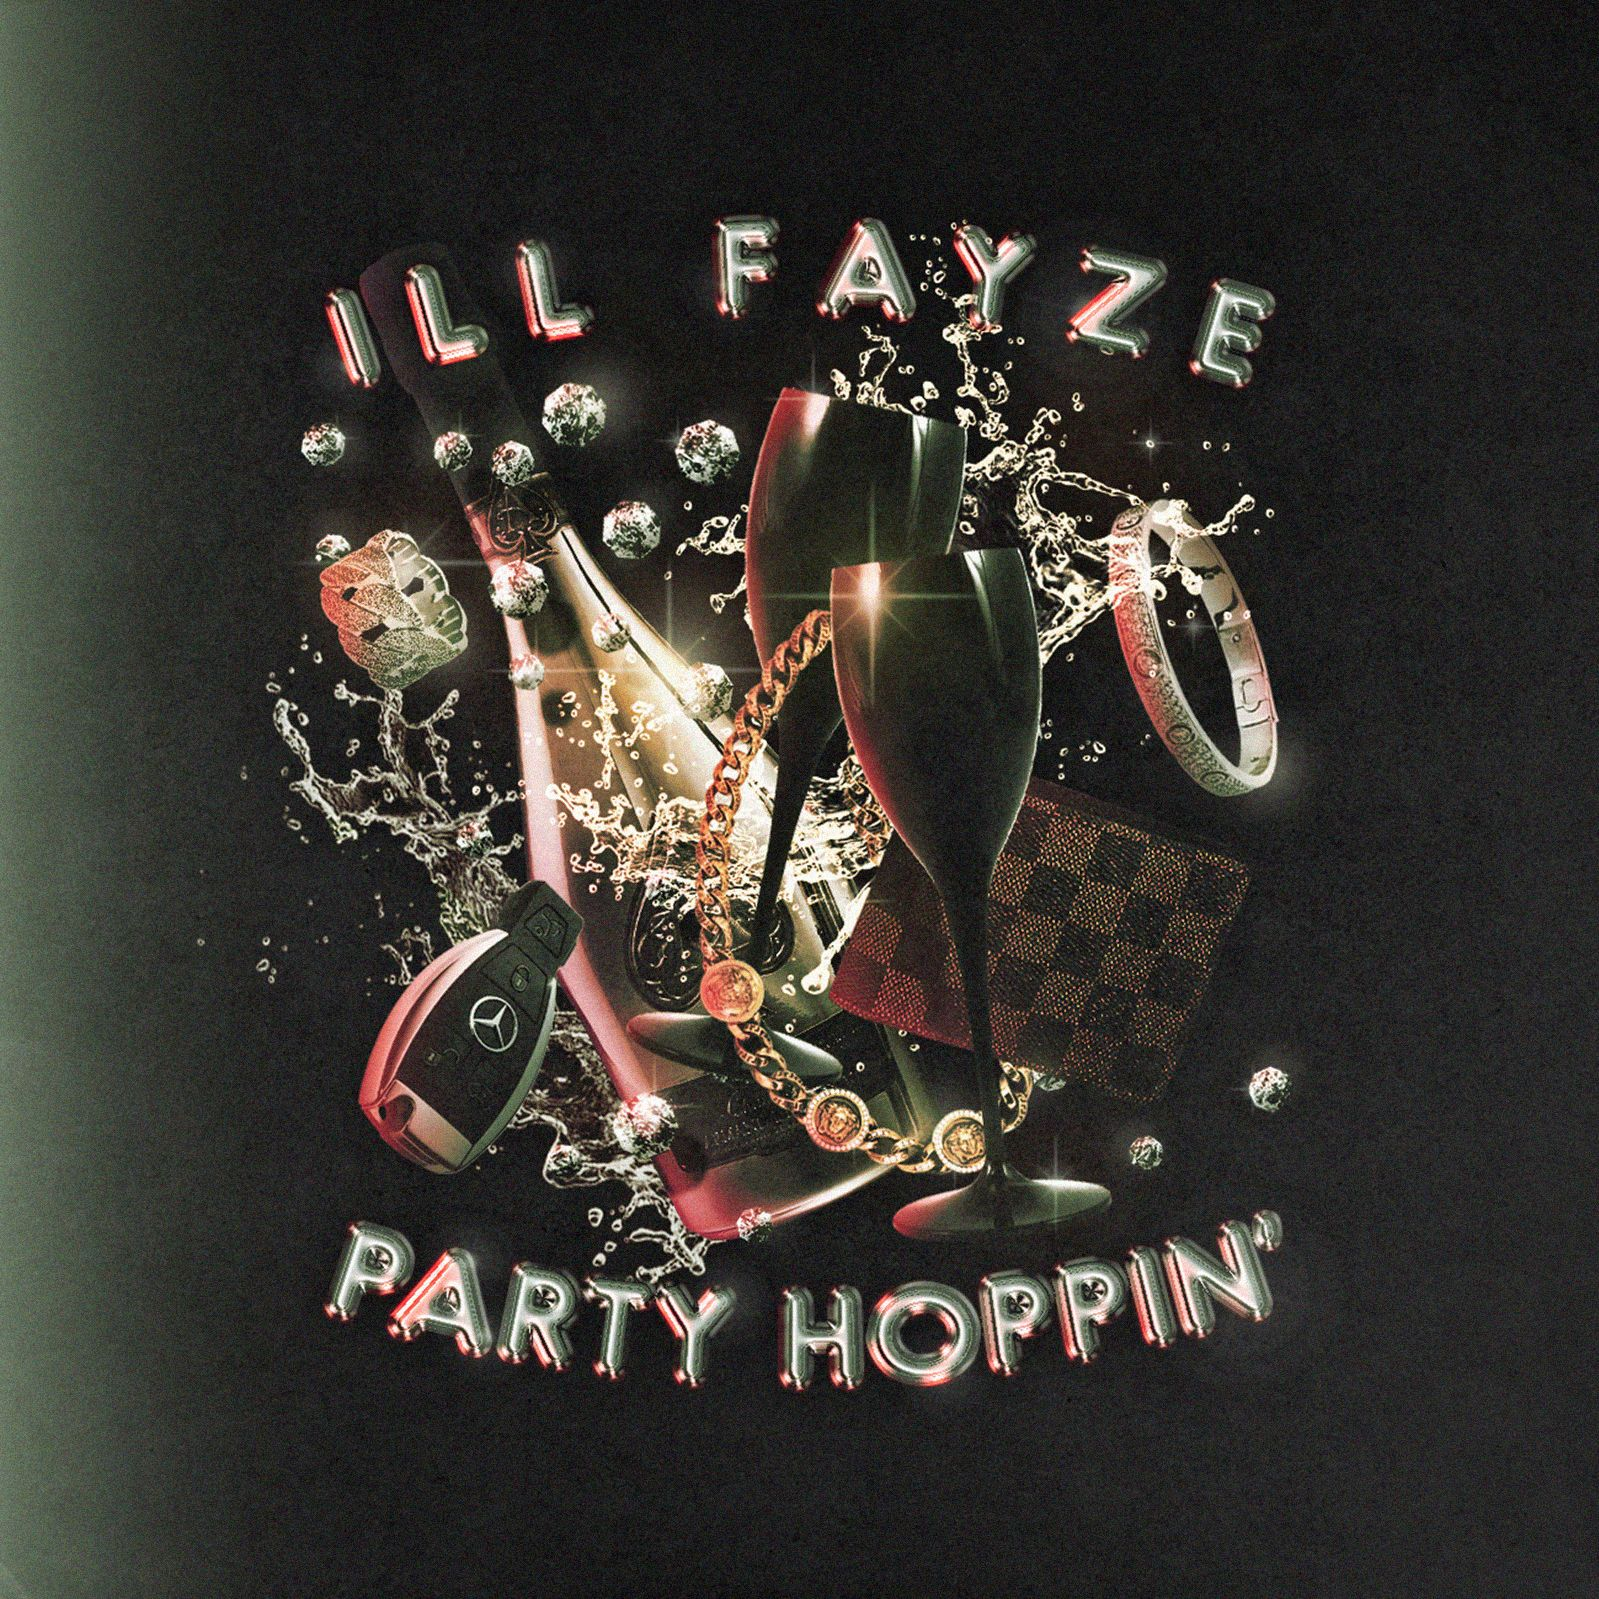 party hoppin.jpg